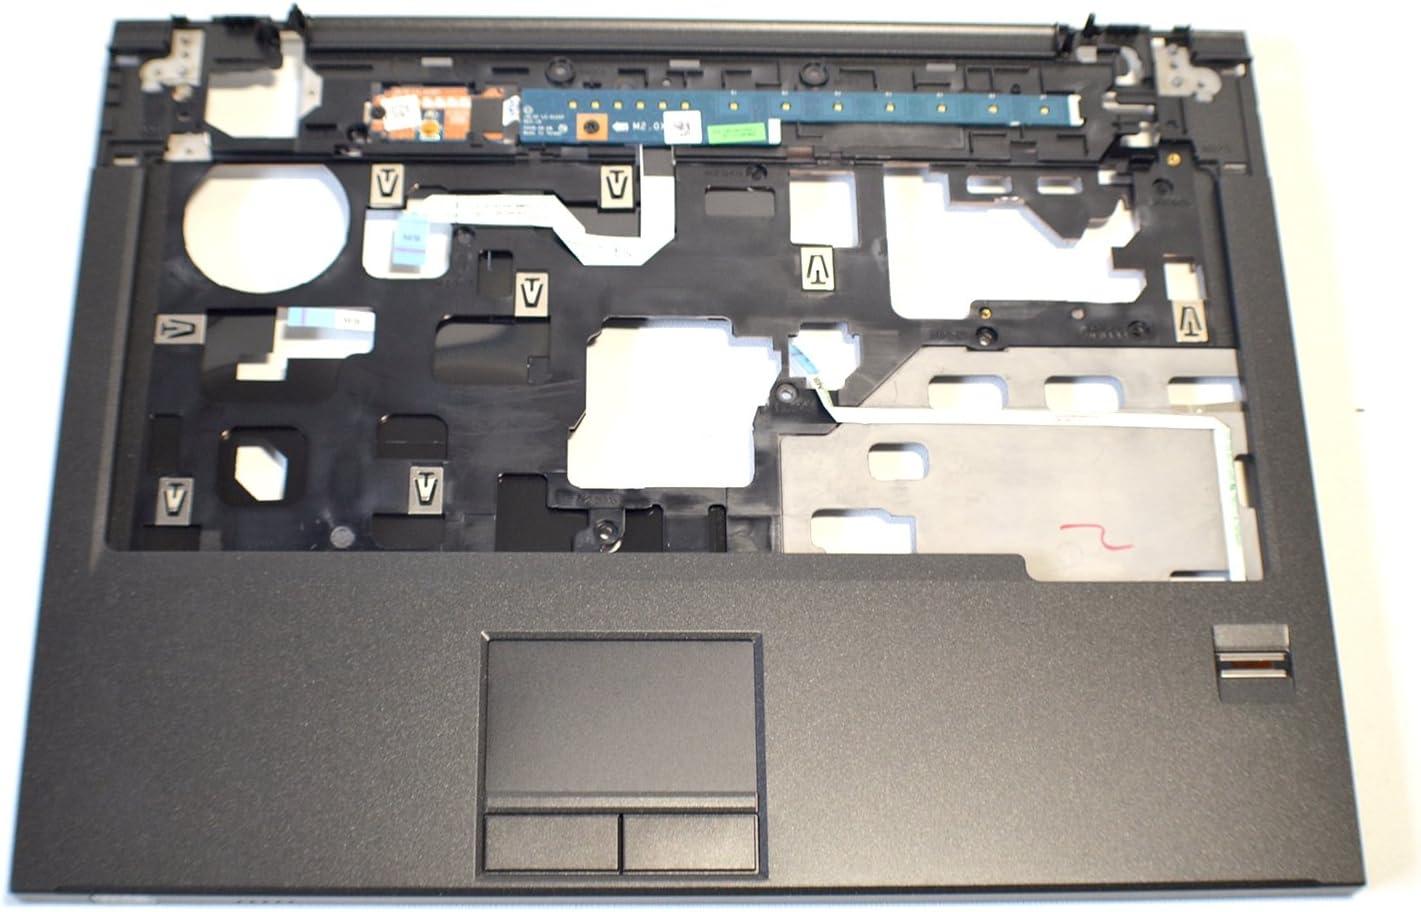 Dell New Vostro 1310 1320 Laptop Notebook Palmrest Touchpad Upper Keyboard Bezel Cover Mouse Button Fingerprint Biometric Reader LED Strip R845J